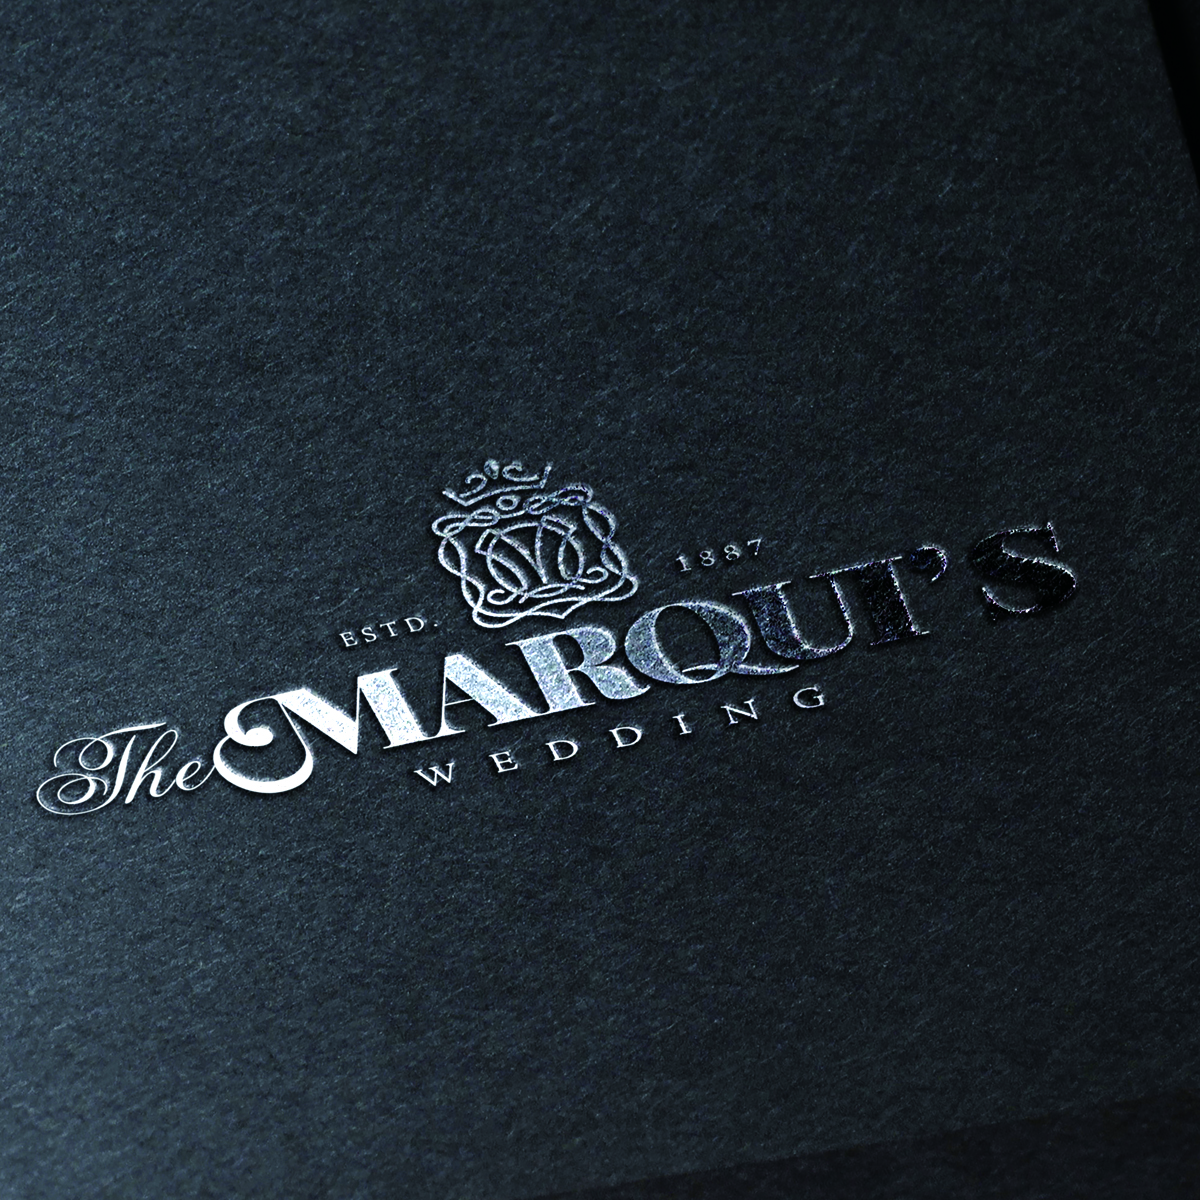 The MARQUI'S LOGO 長崎県南島原の結婚式場ザ・マーキーズ ロゴデザイン